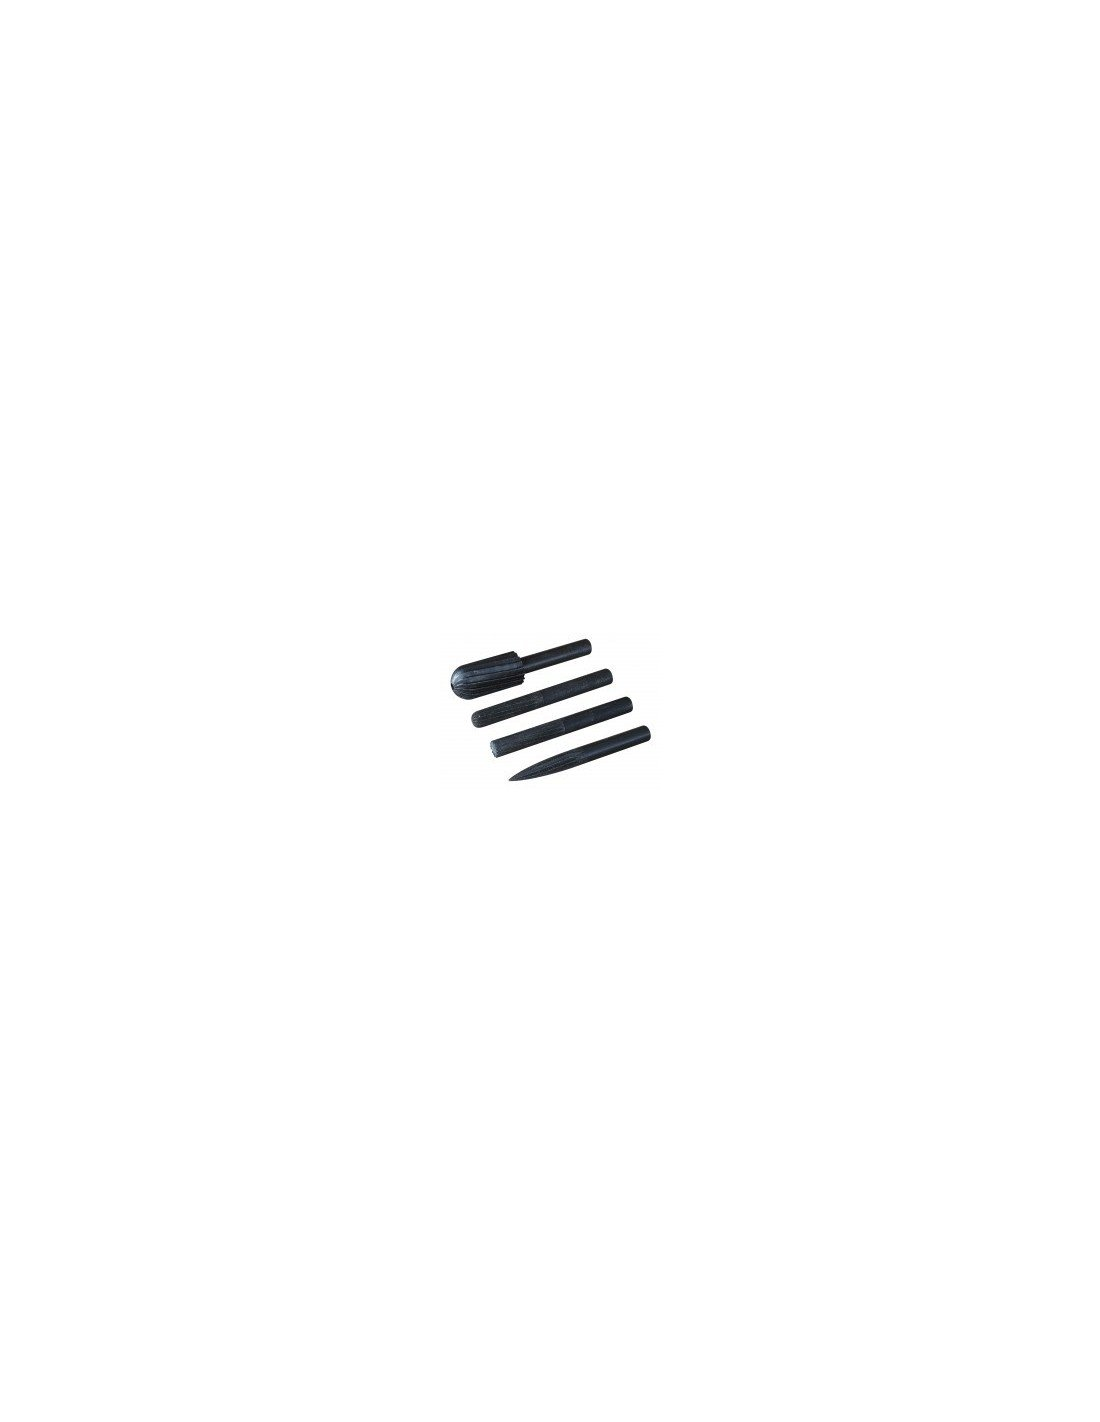 FACOM SC.ASD0x75 Tournevis ProTwist - Empreinte Pozidriv 0x75 mm